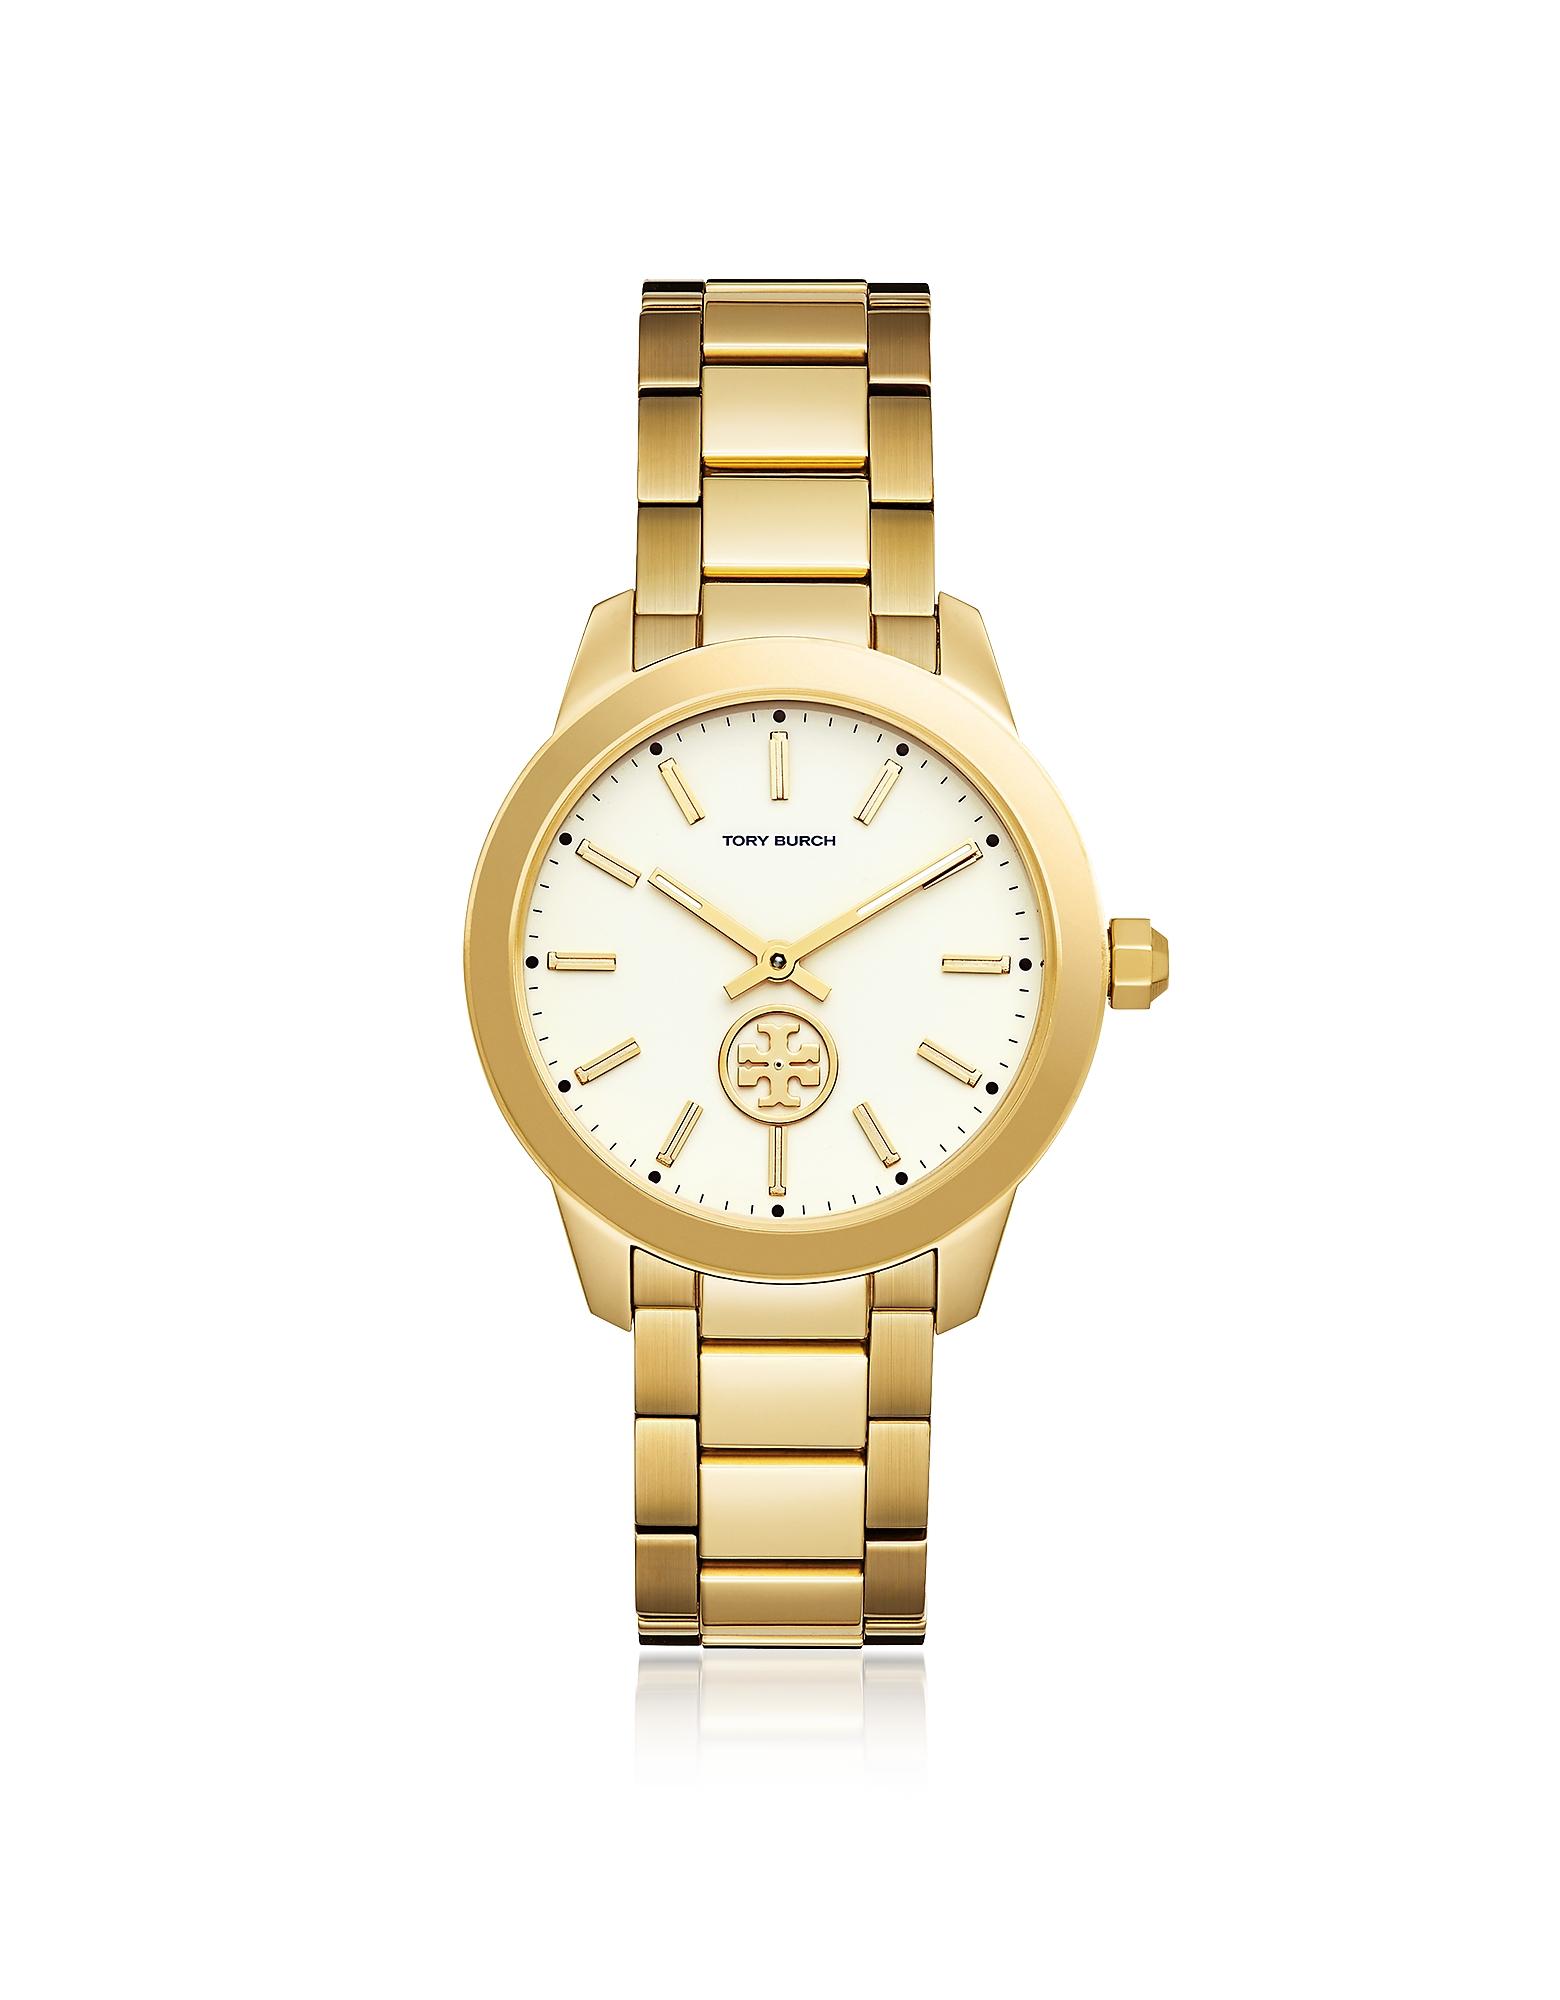 Tory Burch Women's Watches, TBW1200 The Collins Gold Tone Women's Watch